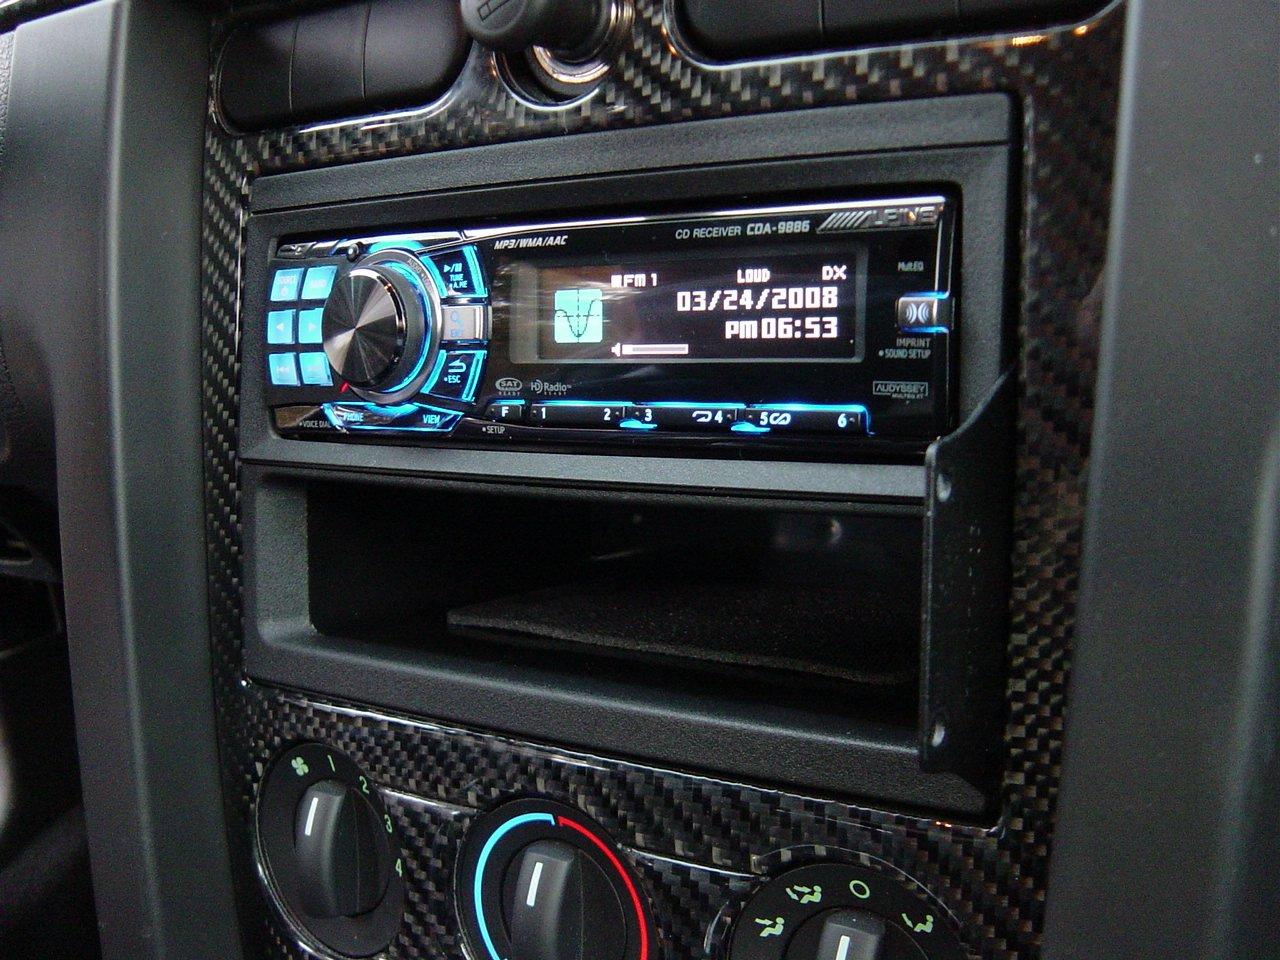 Pleasant Surprise With Shaker 500 Speakers Ford Mustang Forum 2000 Speaker Dsc02545